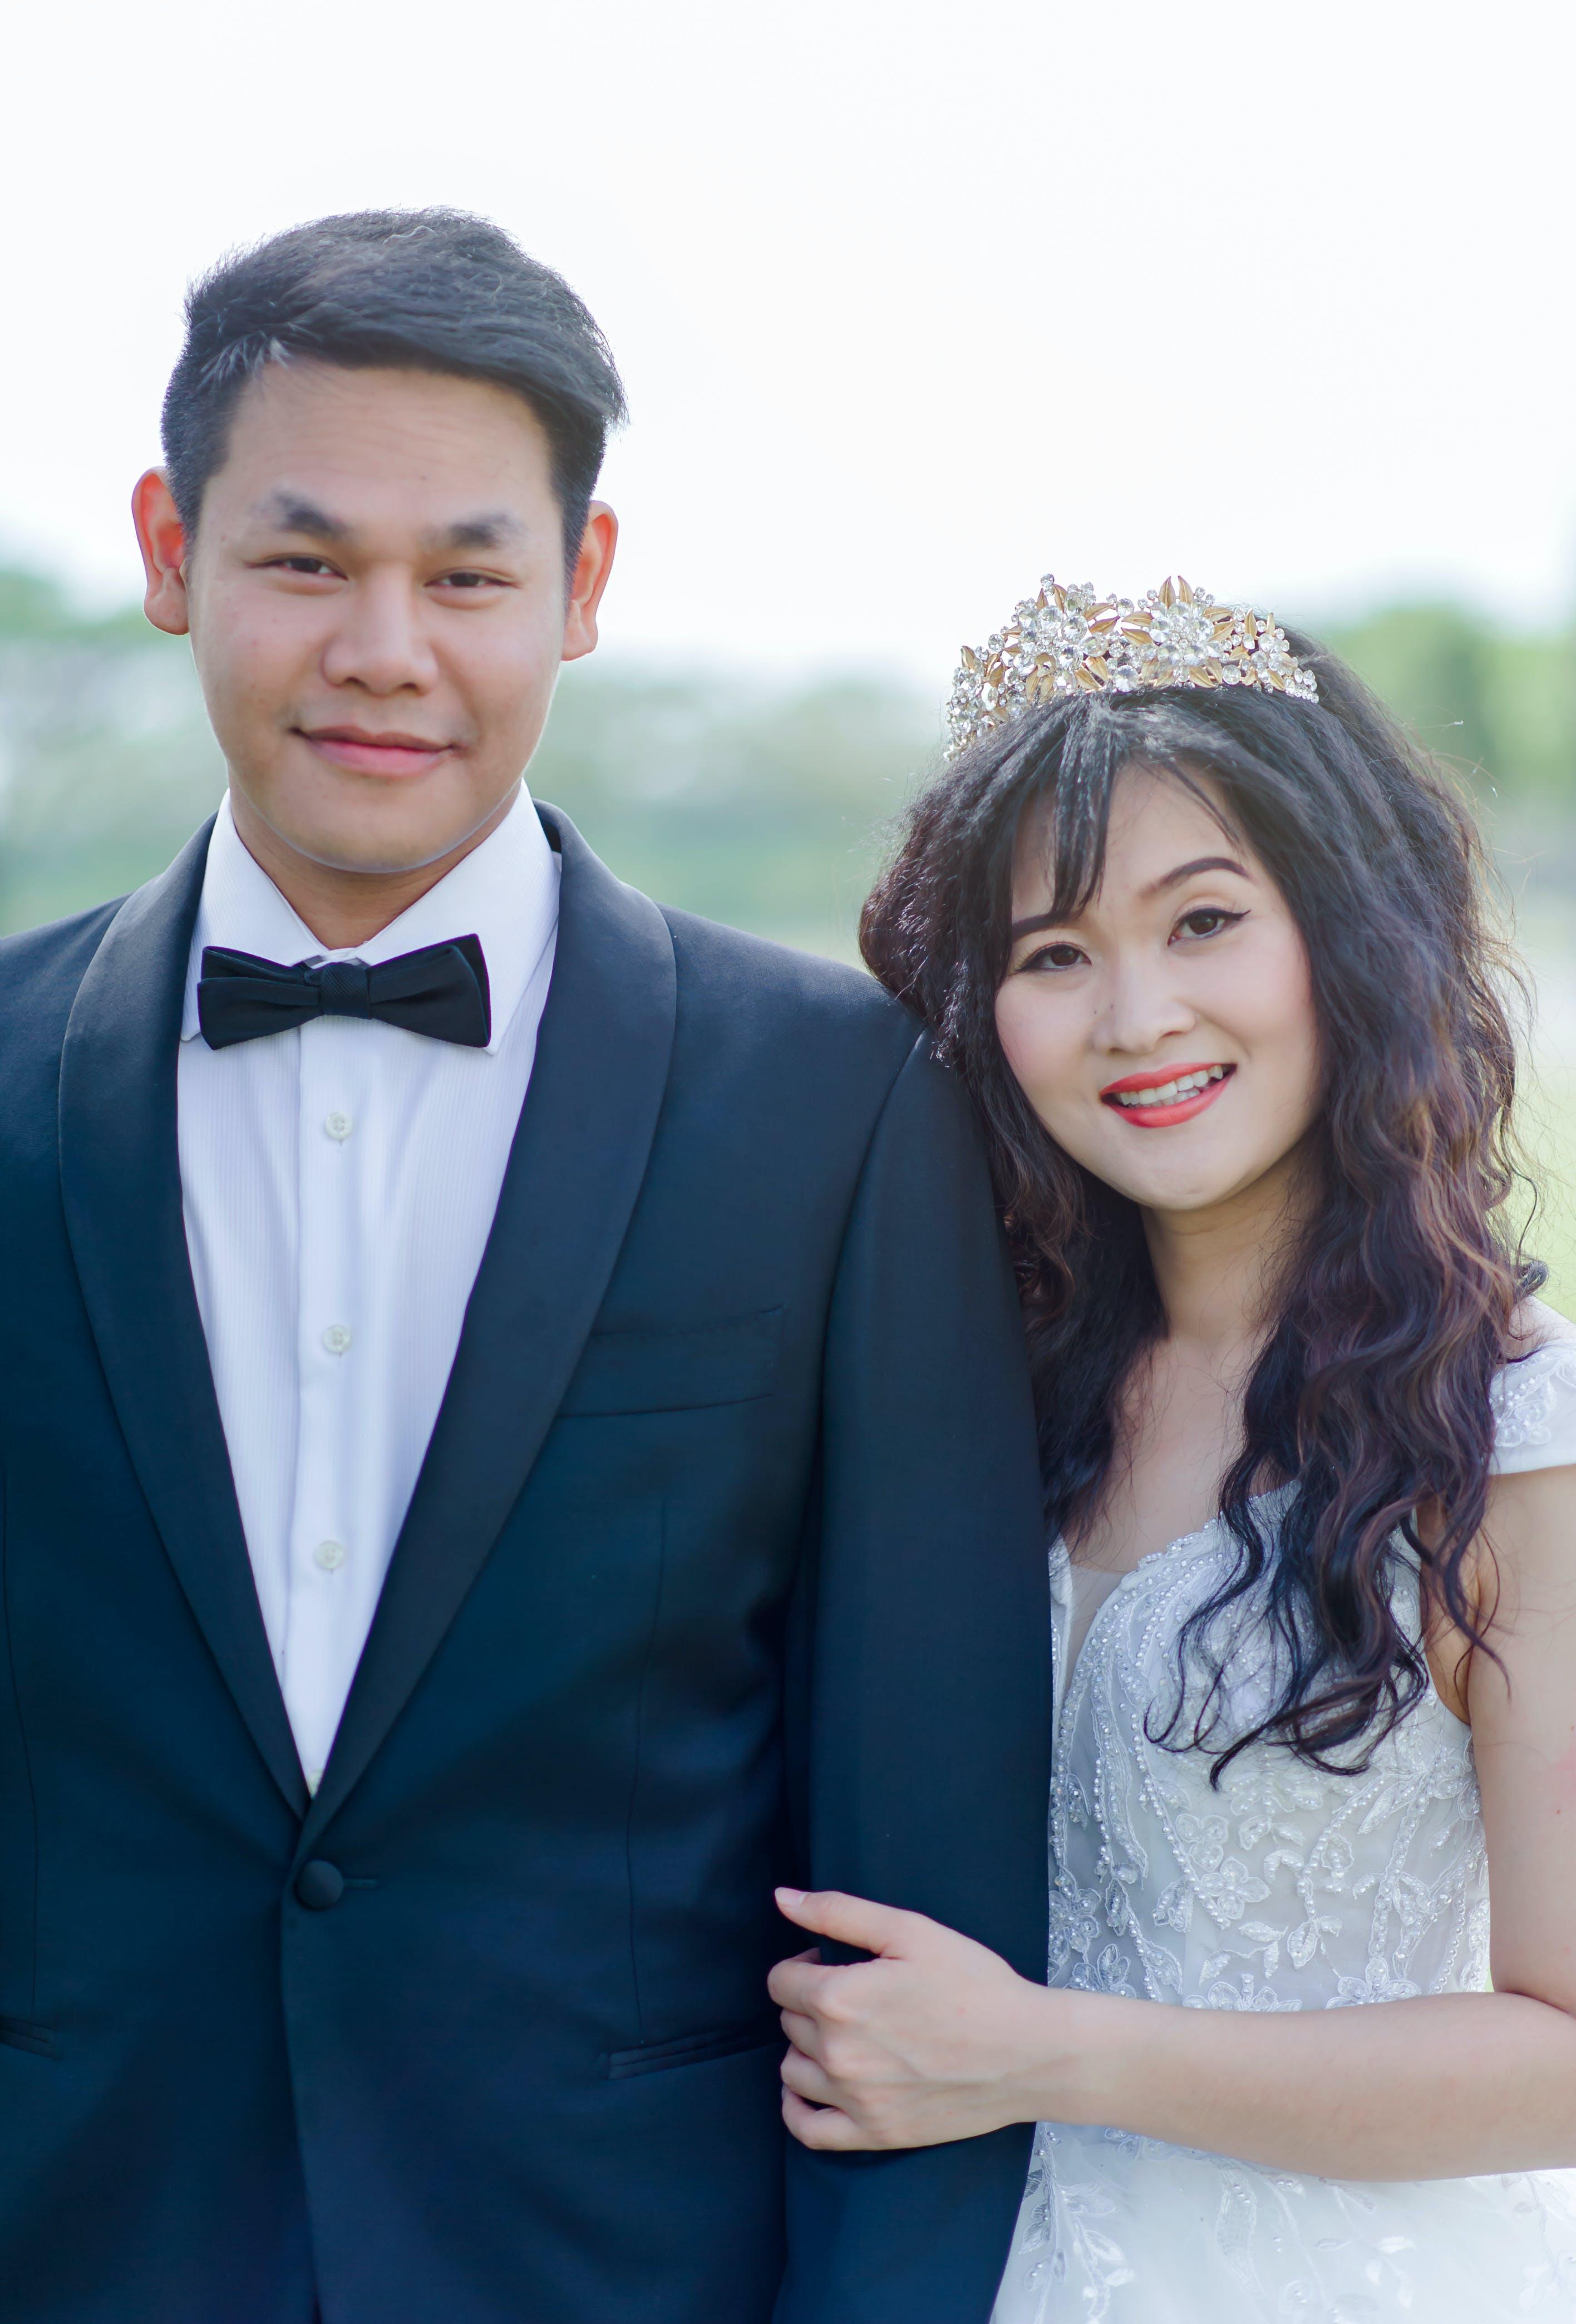 Women's White Floral Wedding Dress and Men's Black 1-button Blazer